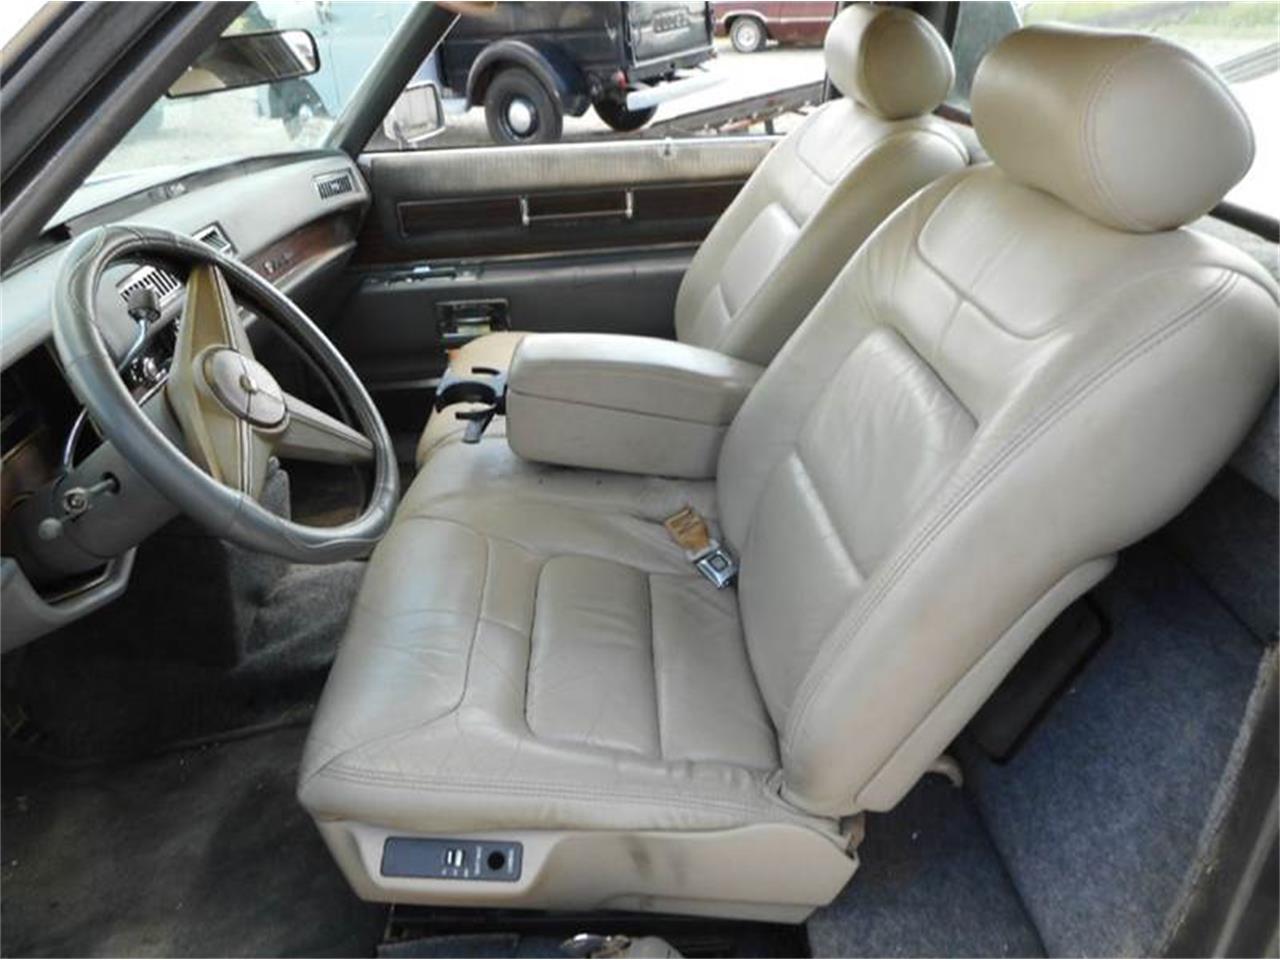 1976 Cadillac 4-Dr Sedan (CC-991113) for sale in Staunton, Illinois